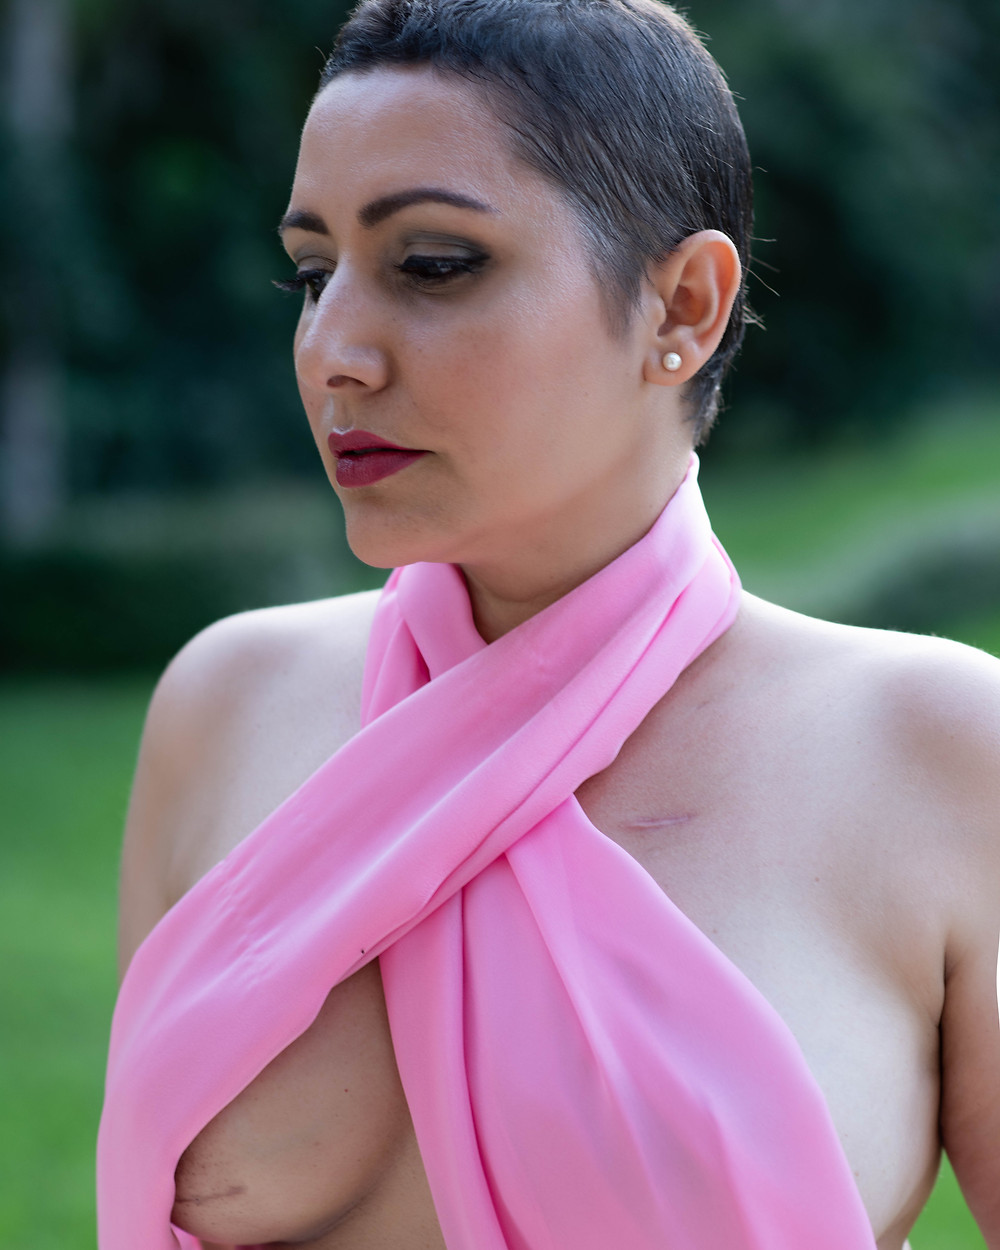 Breast Cancer Awareness, pink ribbon top